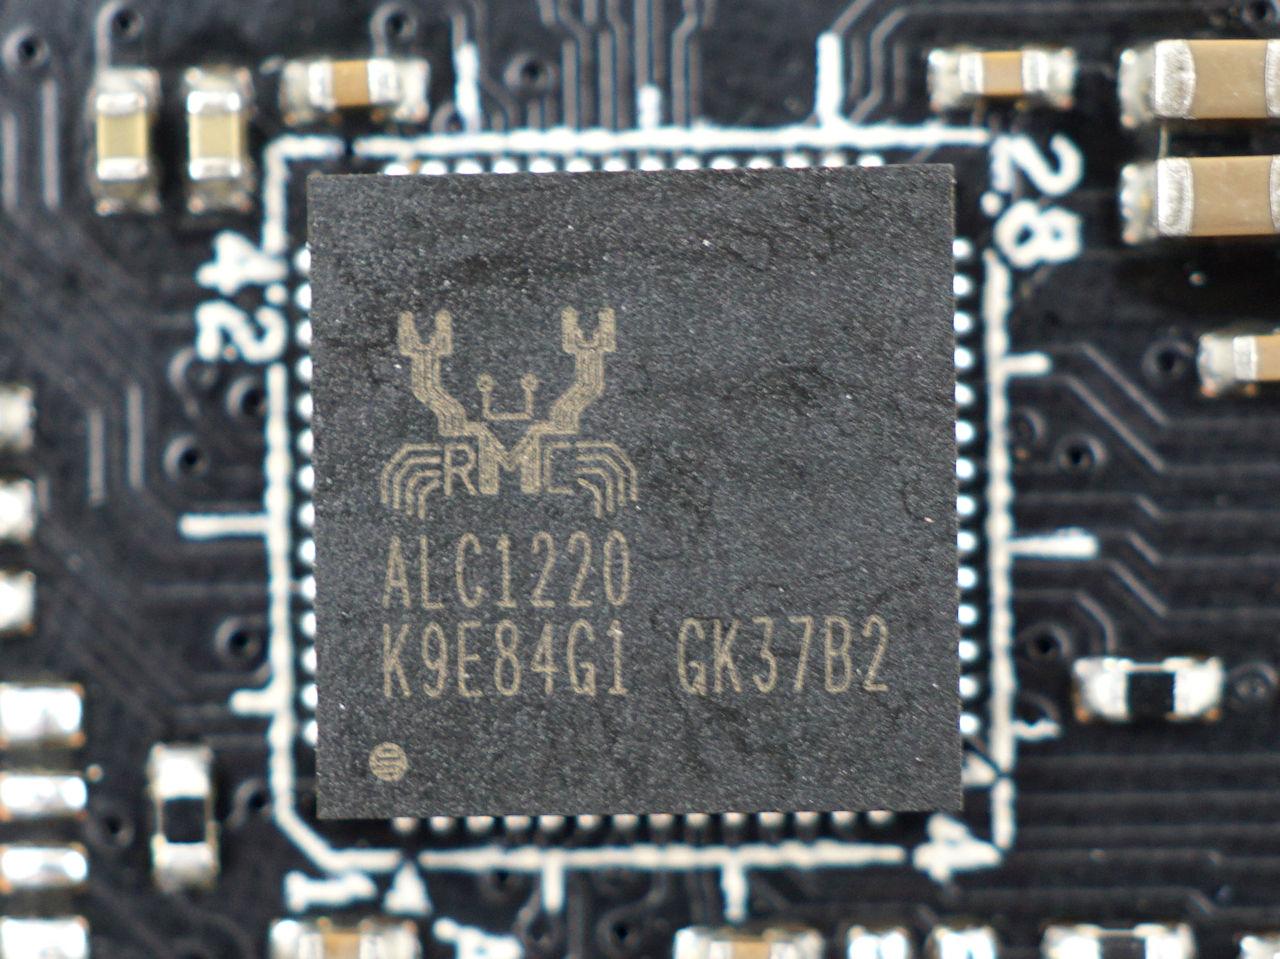 NZXT N7 B550